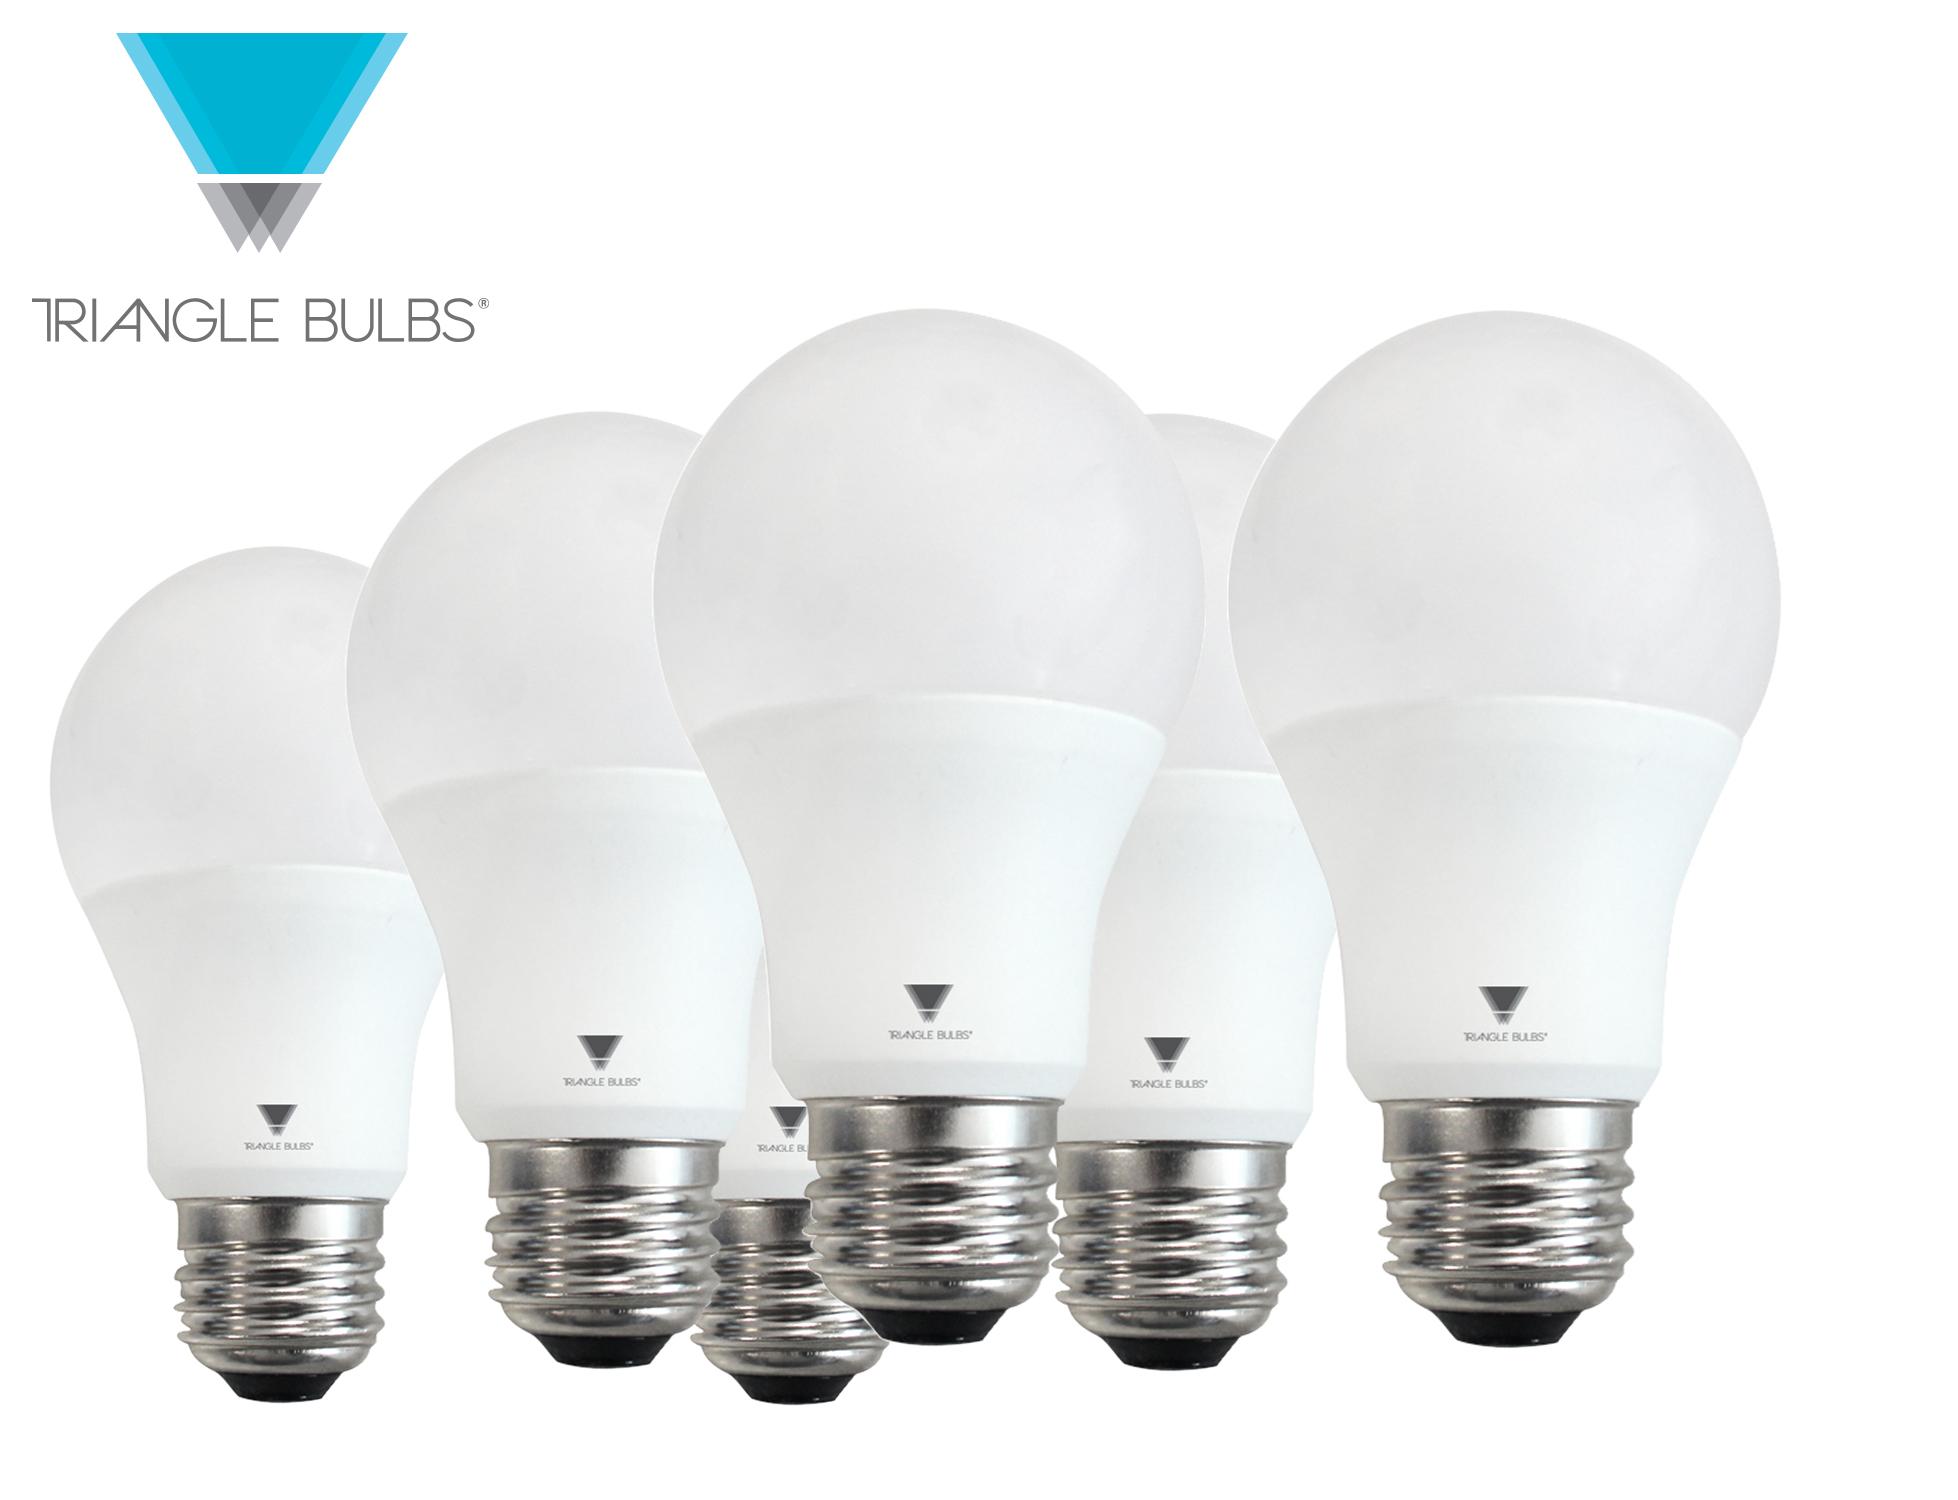 triangle bulbs a19 led 60 watt equivalent daylight 5000k. Black Bedroom Furniture Sets. Home Design Ideas